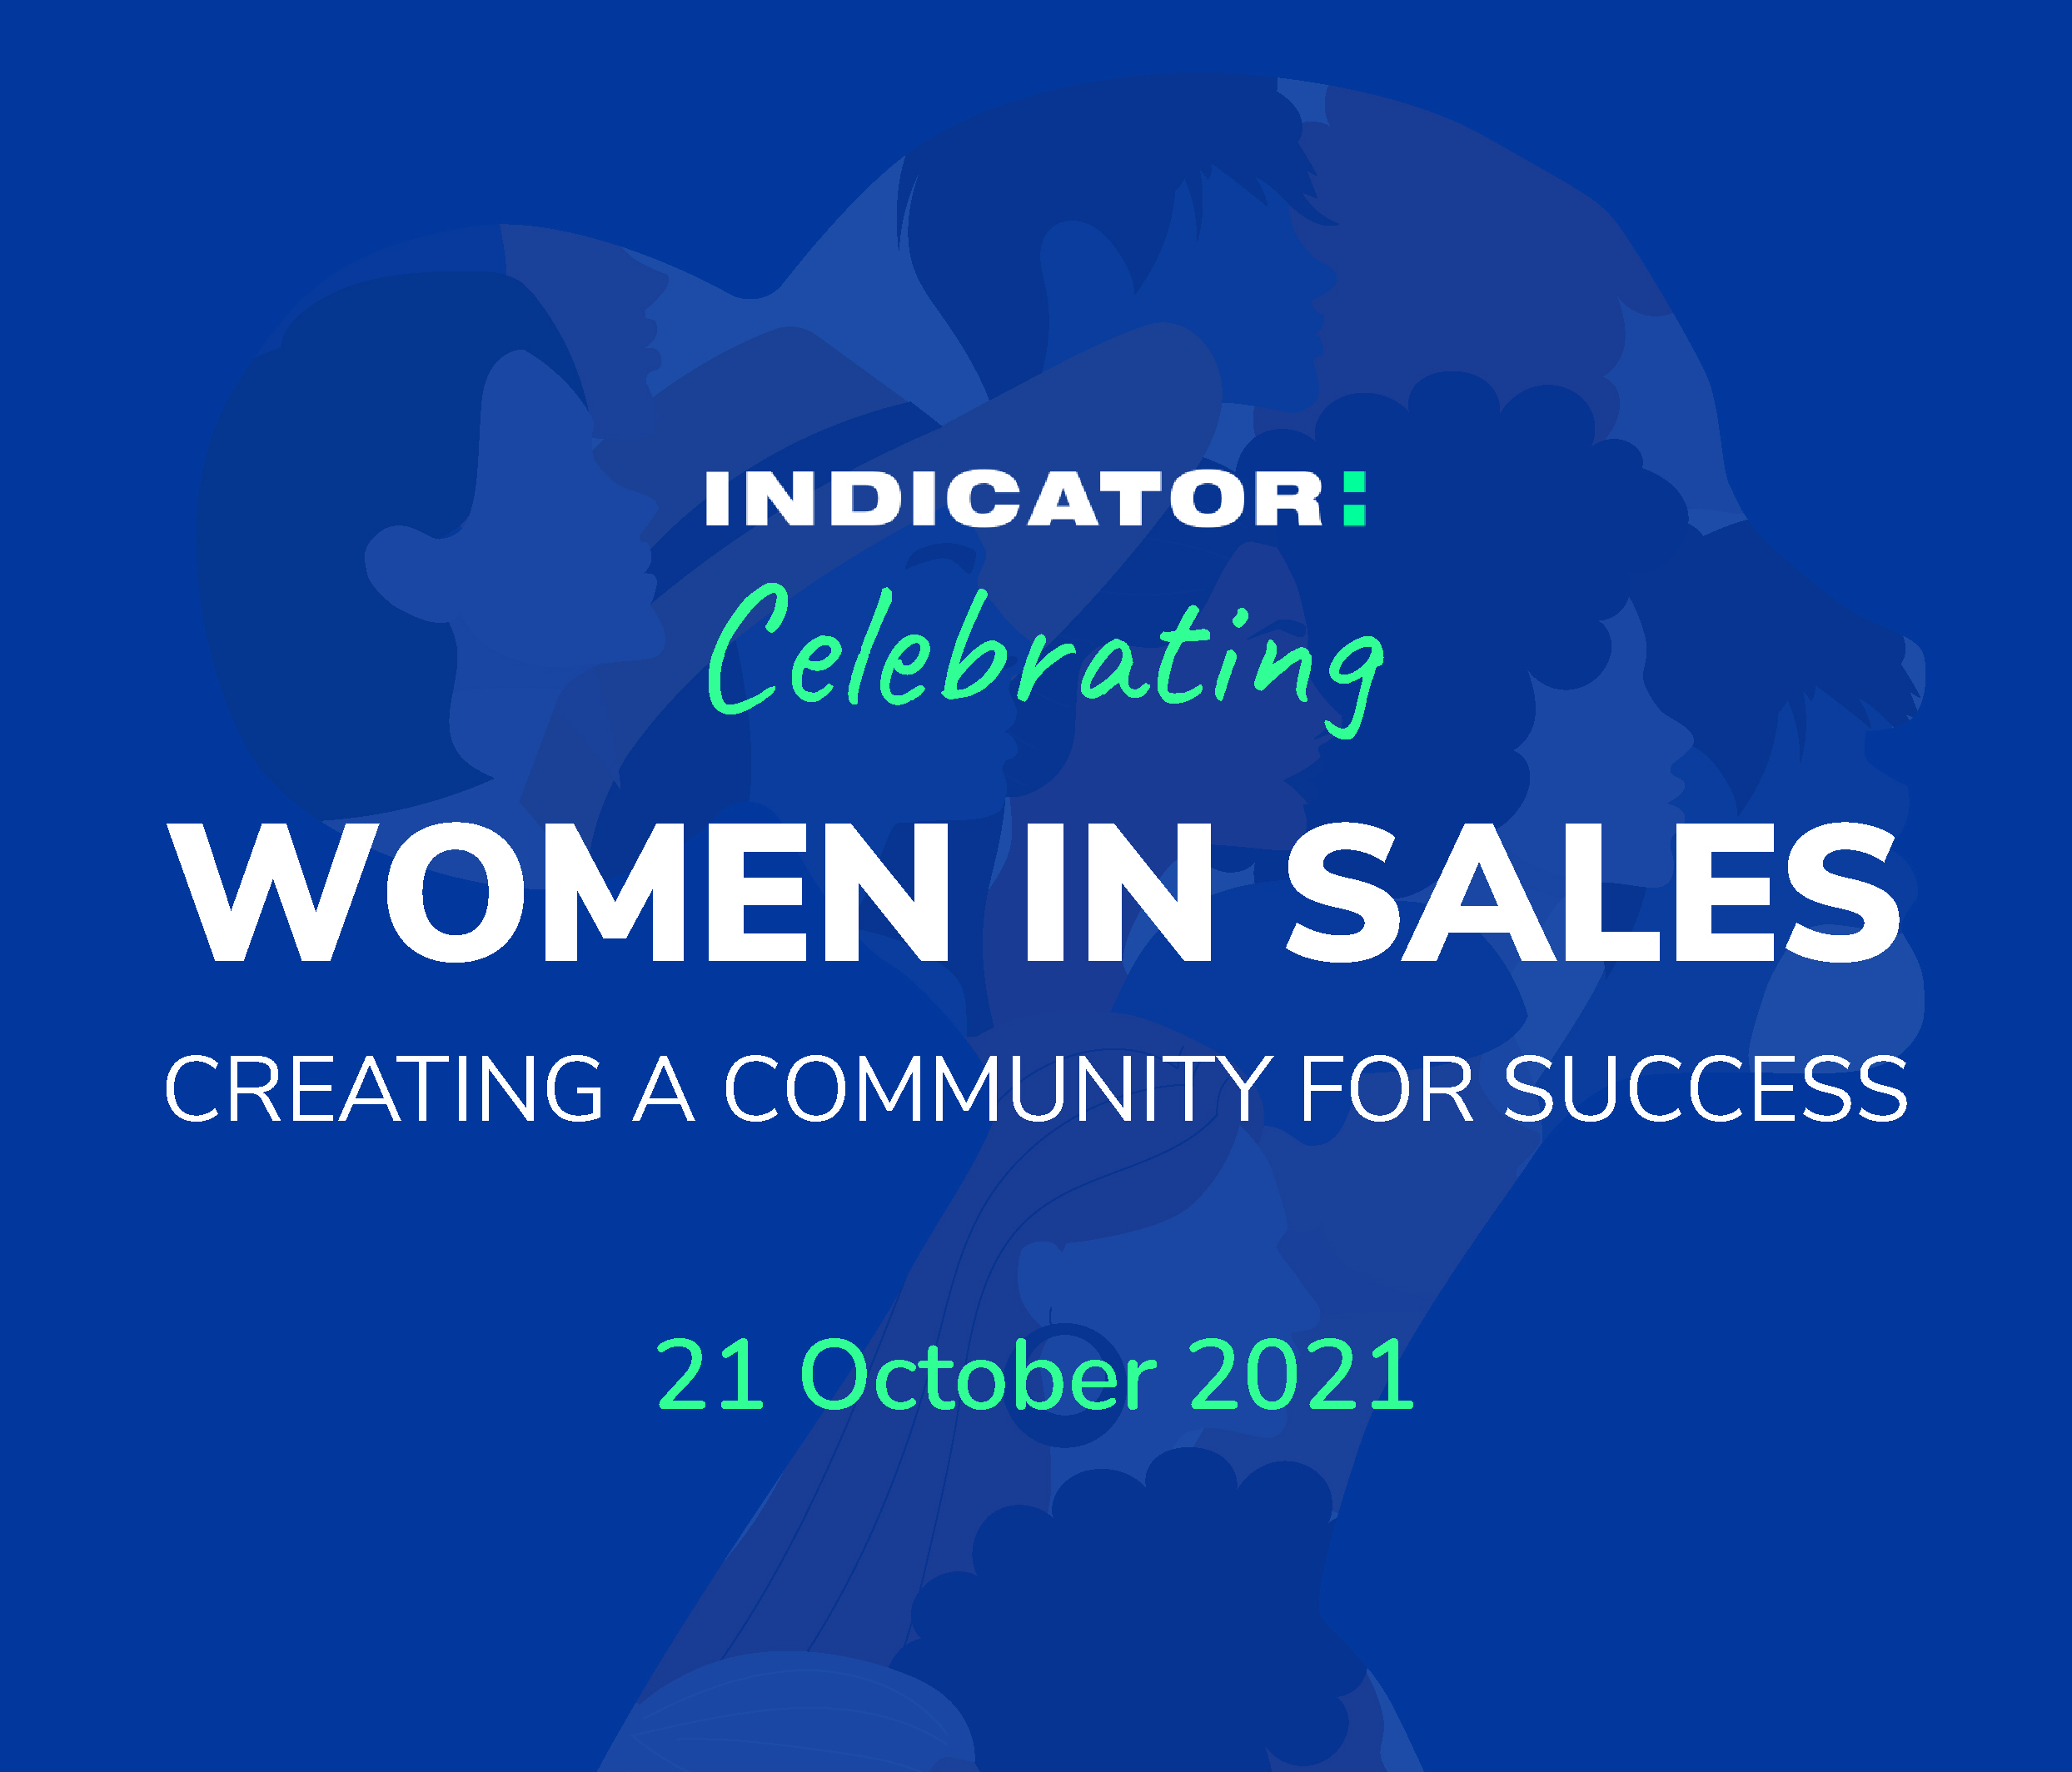 Women in Sales - Graphics template-03